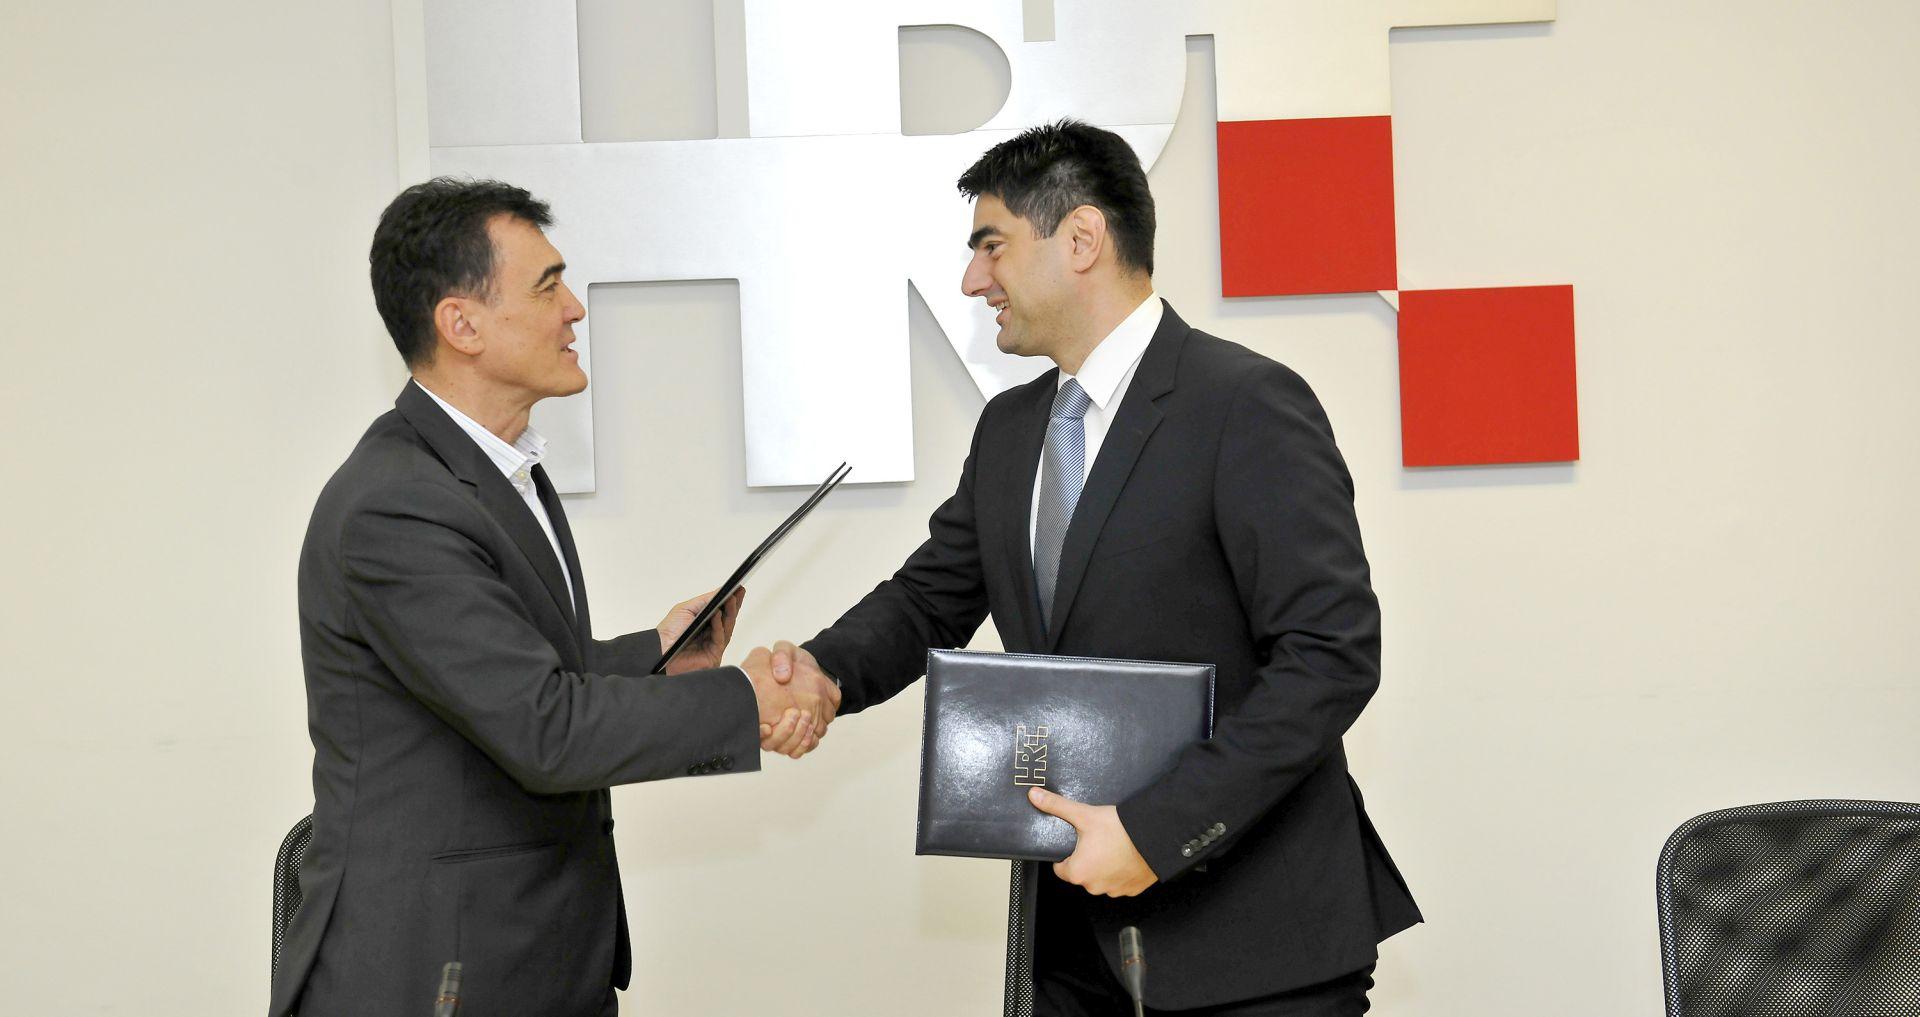 HRT: Goran Radman predao dužnost Siniši Kovačiću